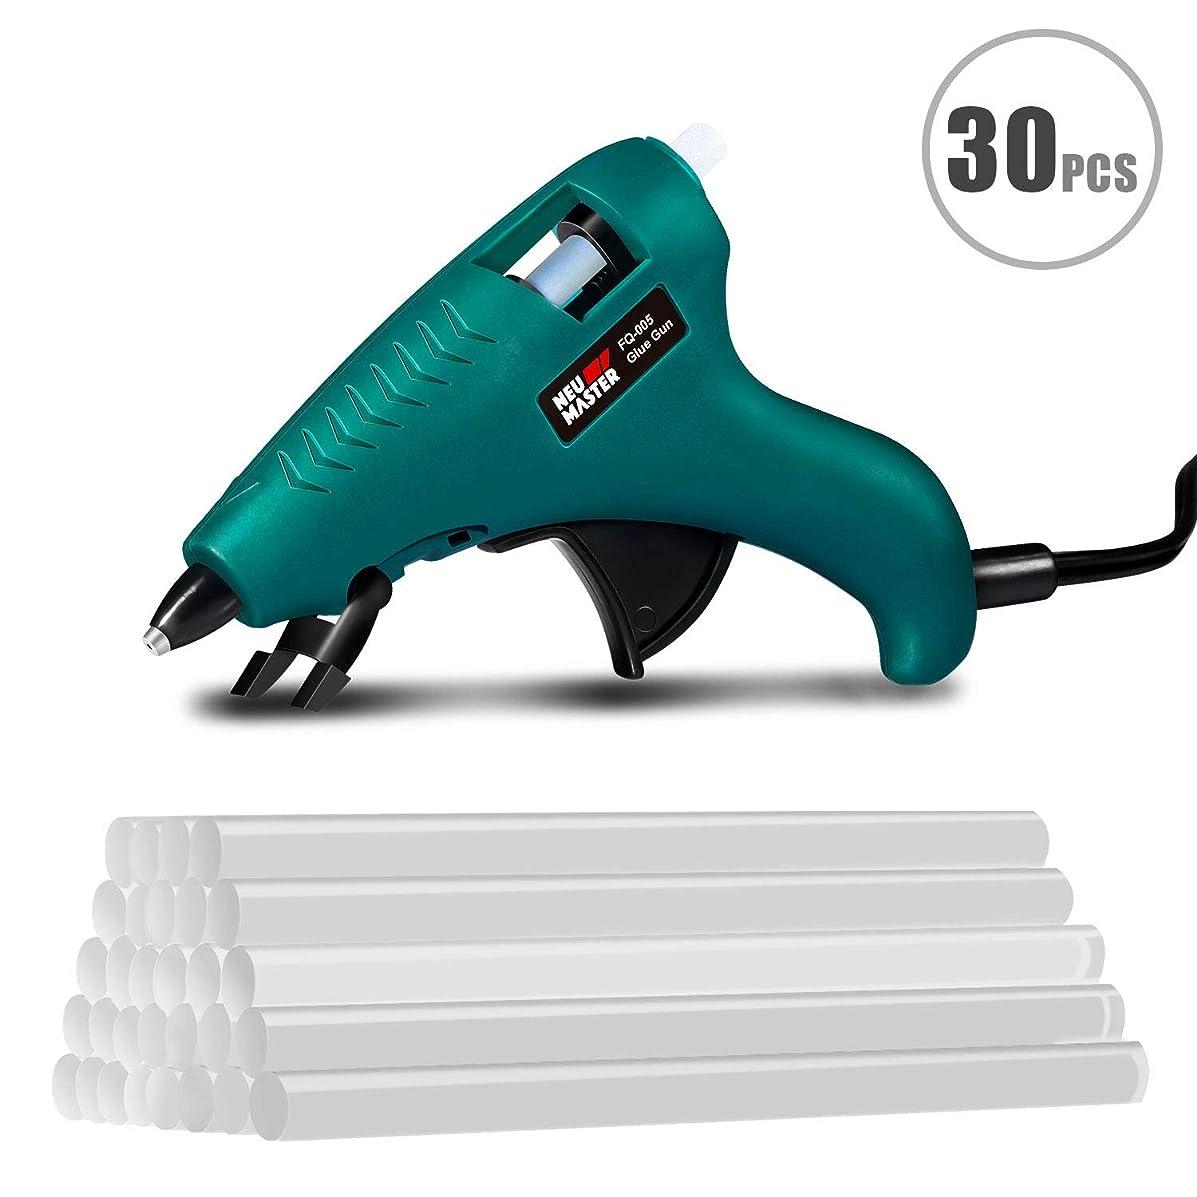 Hot Glue Gun,Mini Glue Gun Kit with 30pcs Glue Sticks for DIY Small Craft Projects & Sealing and Quick Repairs by NEU Master